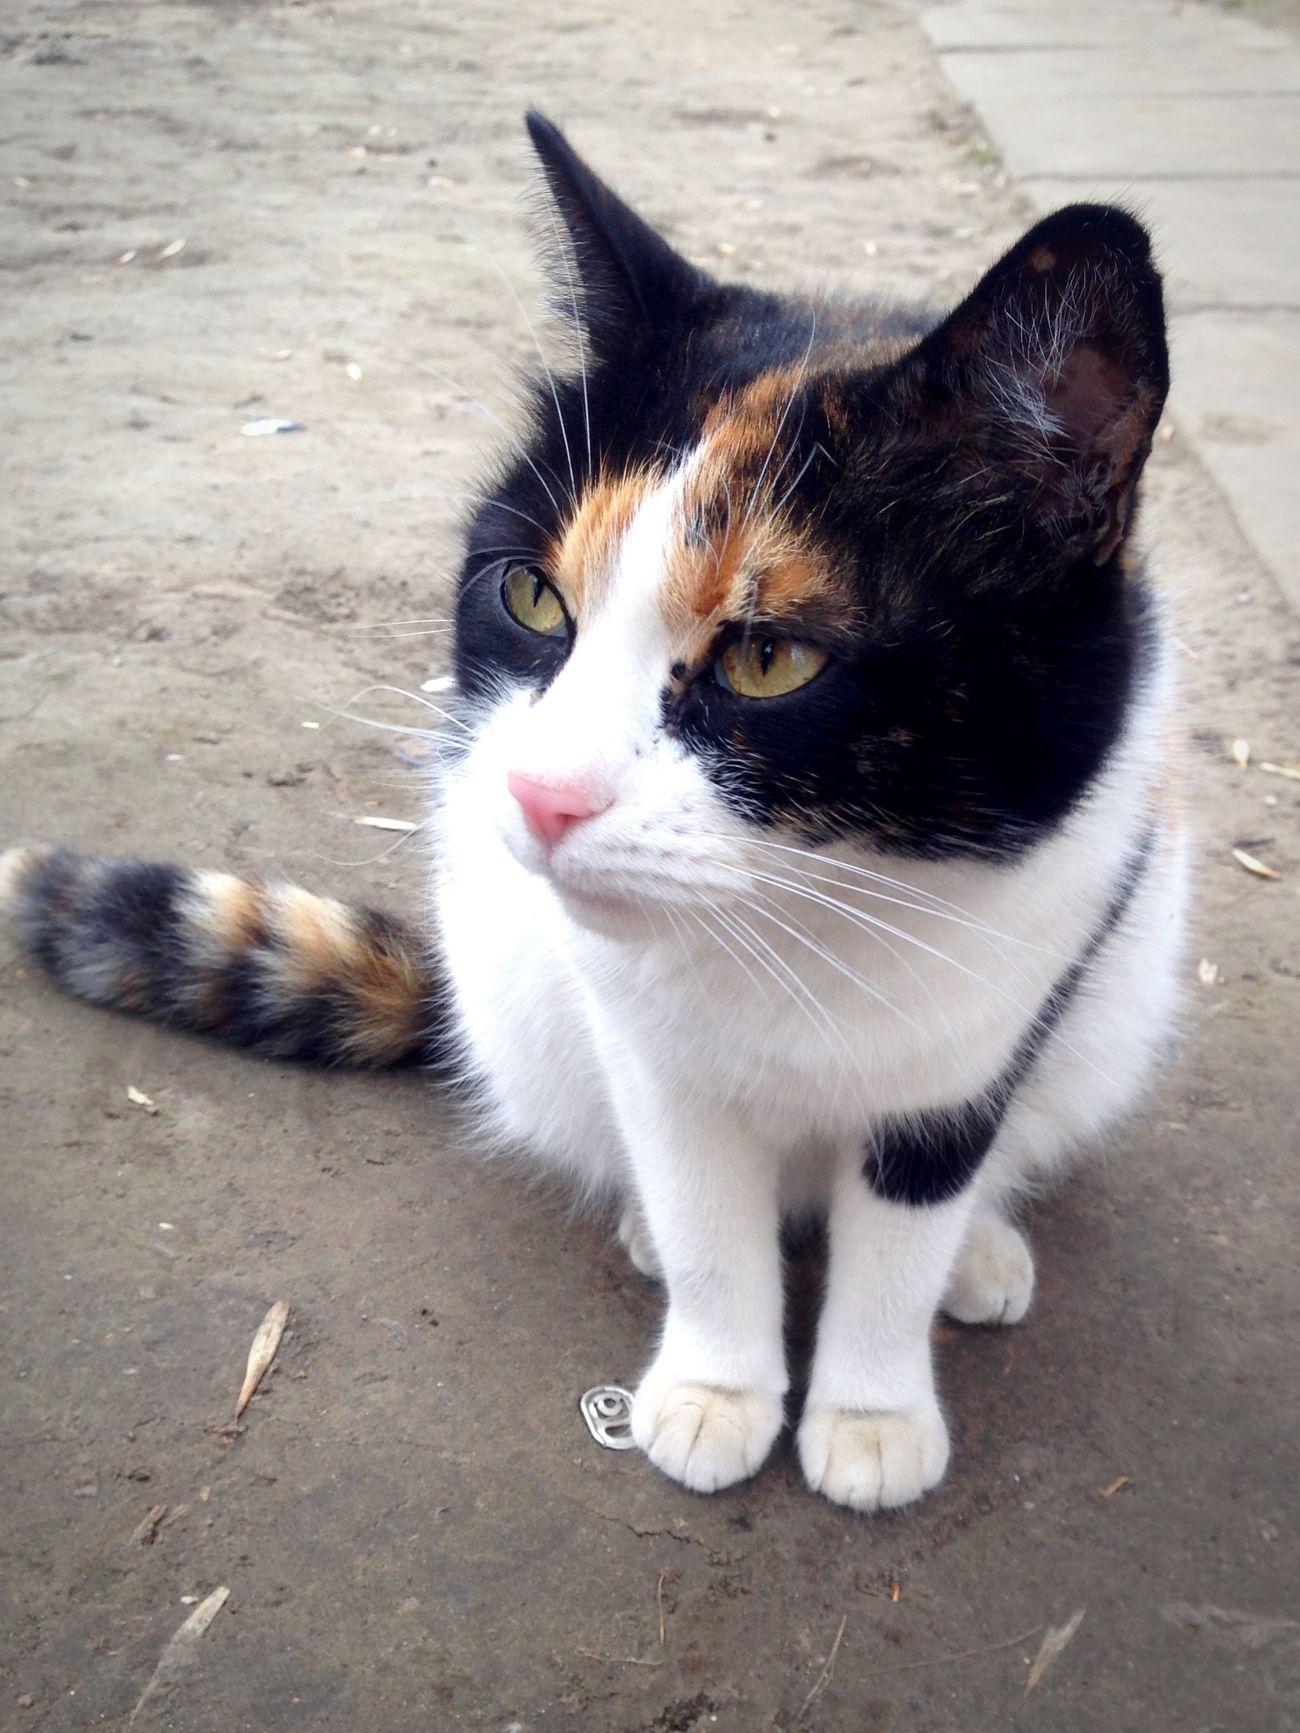 Котик Коты кот котэ Cat Lovers Cats Of EyeEm Cat♡ Cat Cats Cats 🐱 Homeless Cats